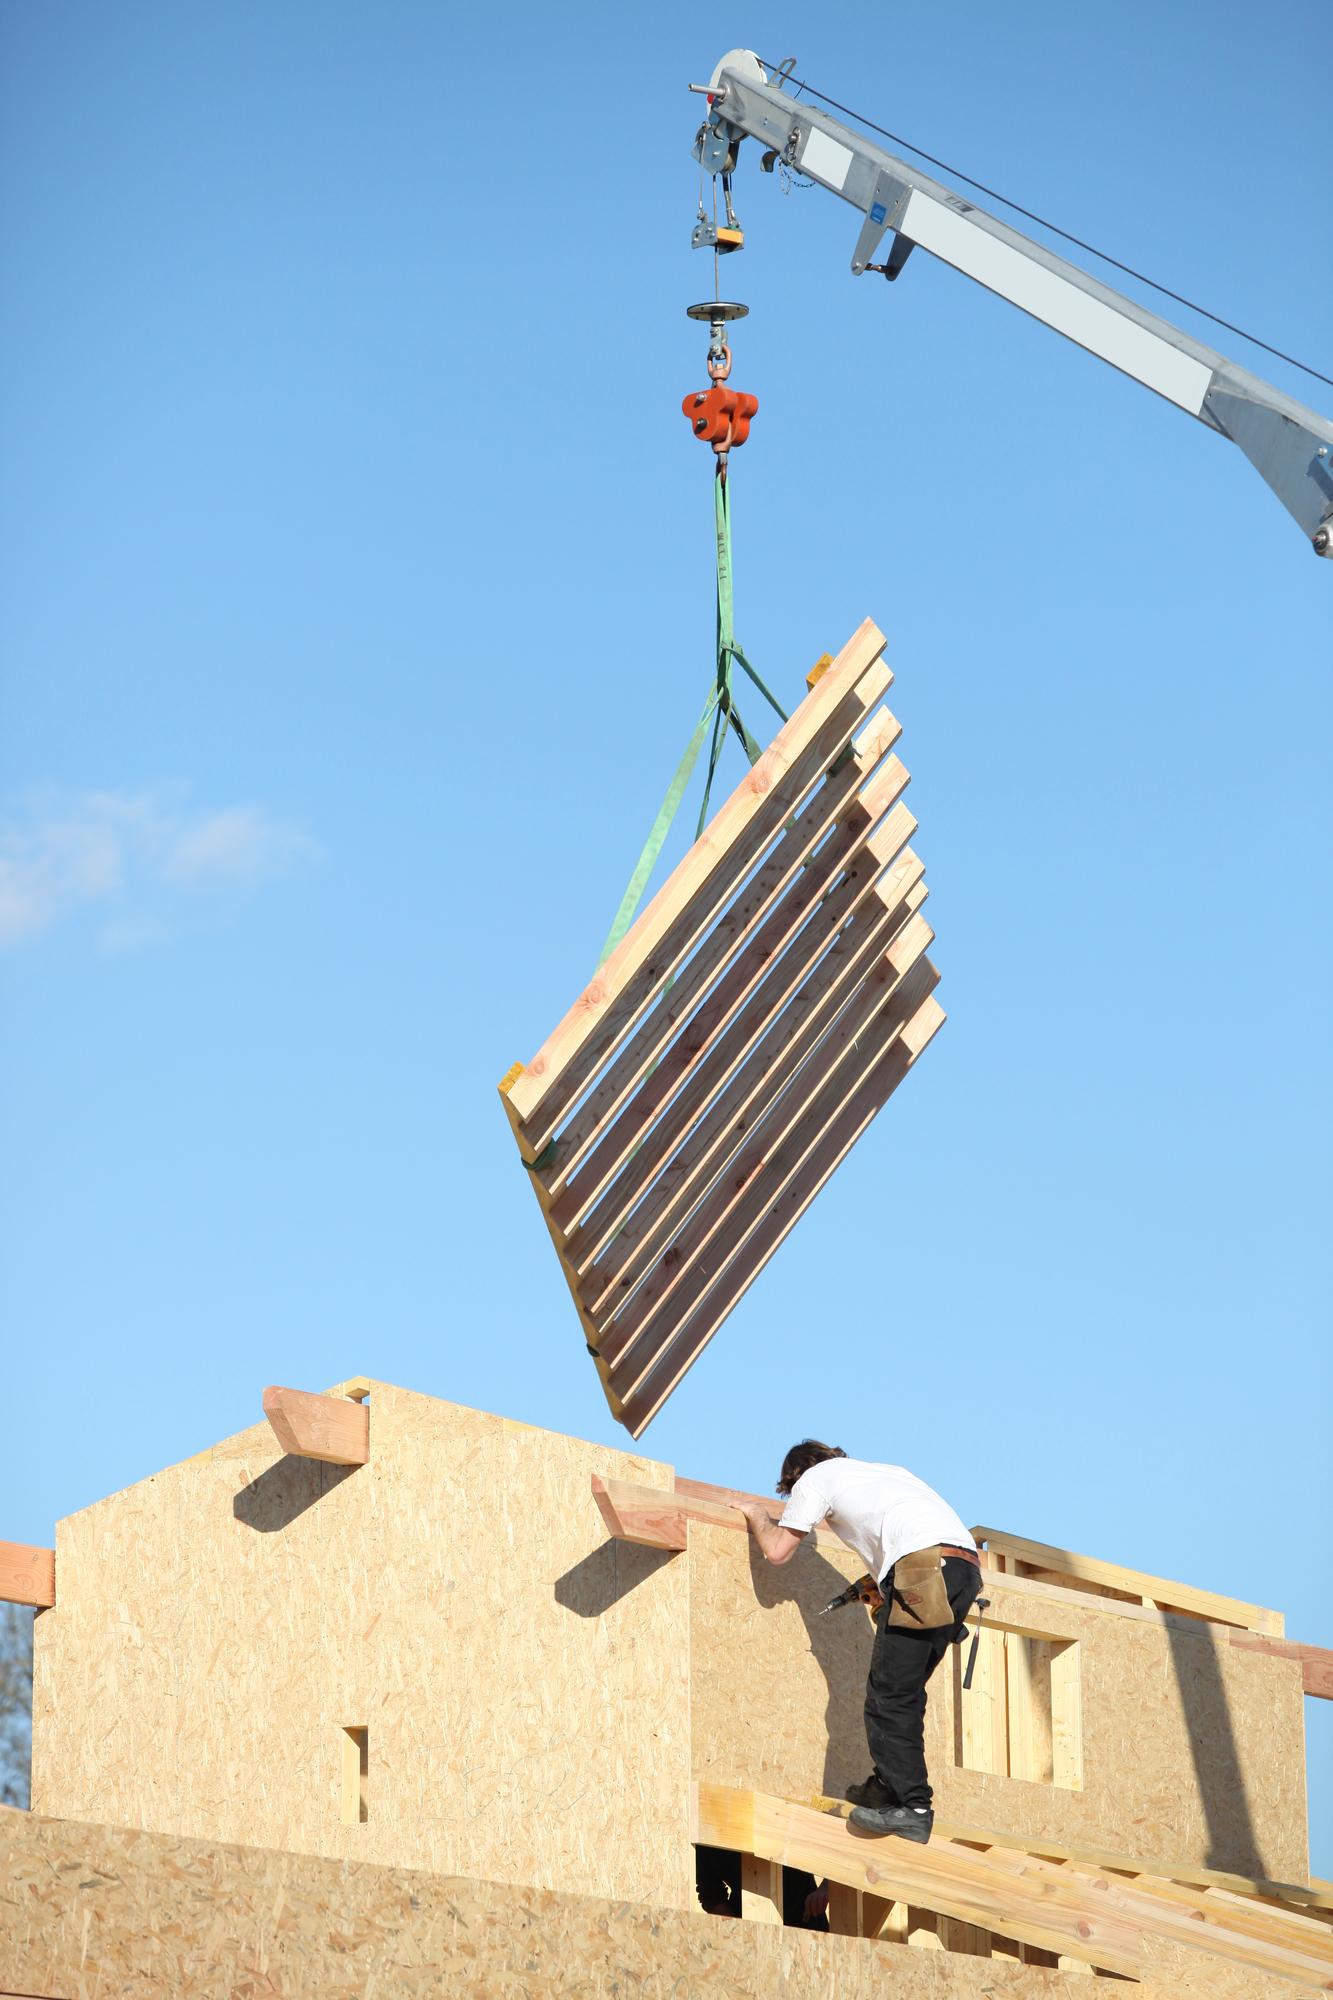 Overhead Crane Load Dropped